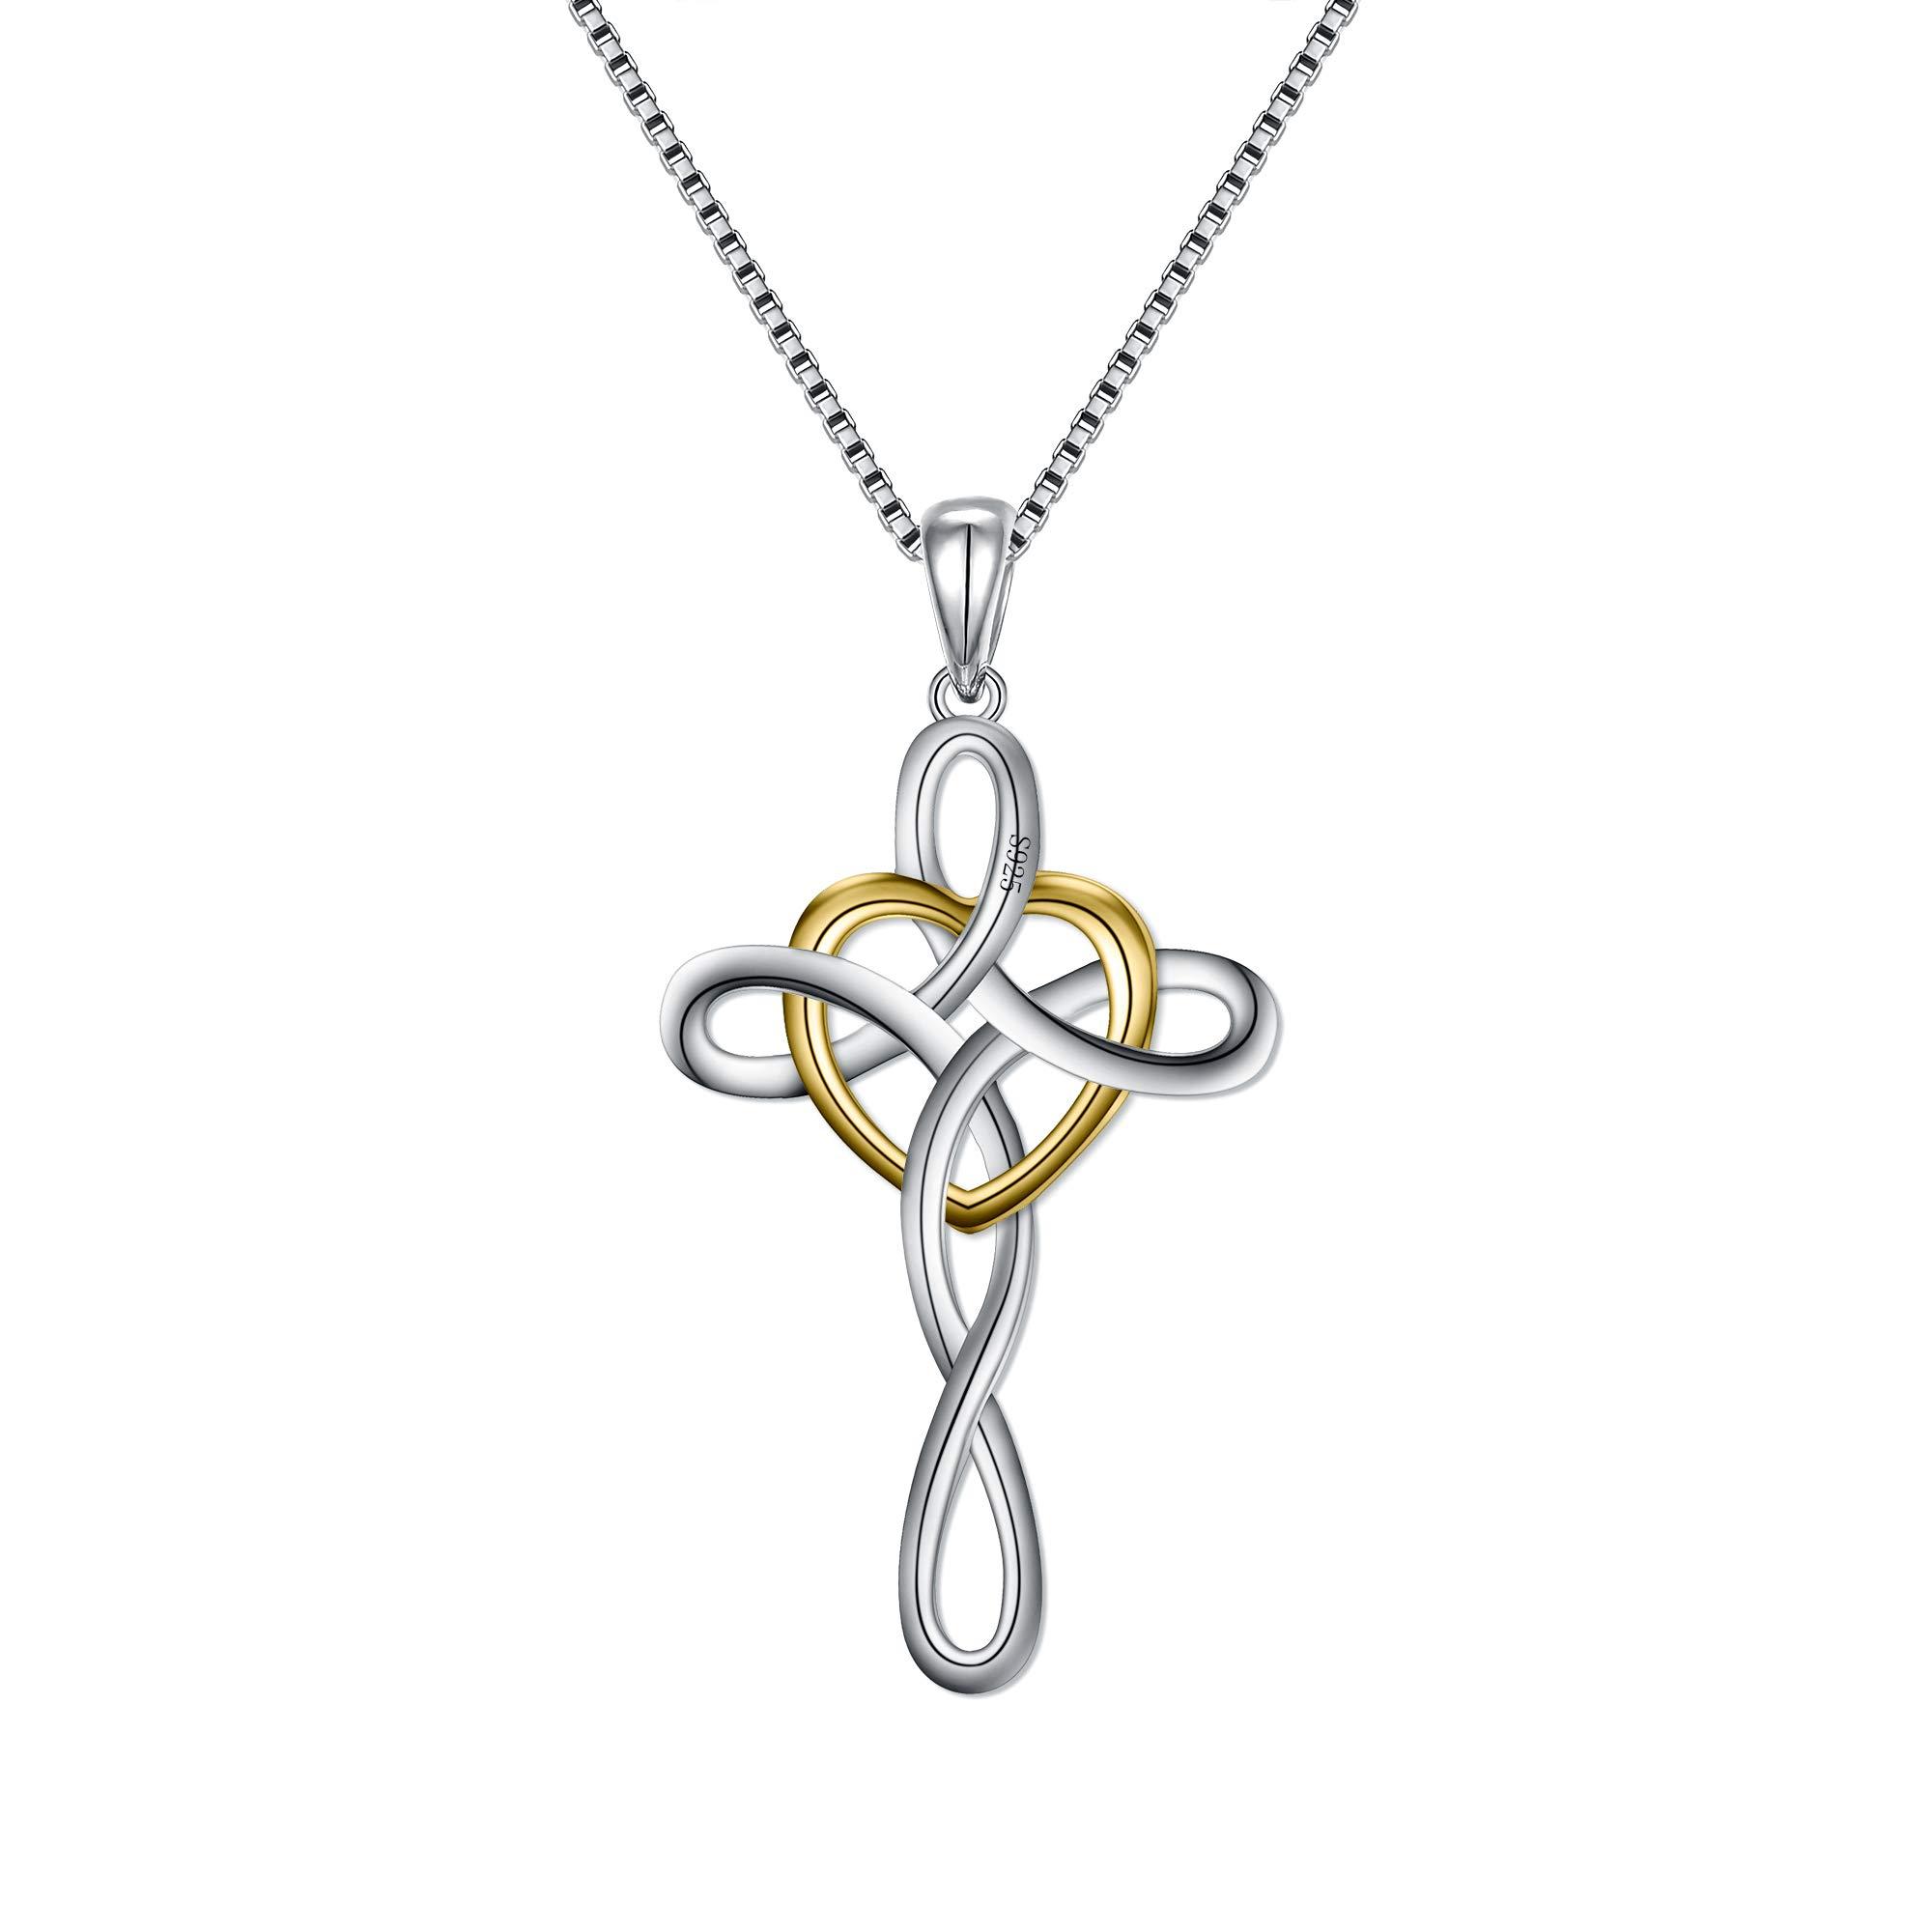 FANZE Women's 925 Sterling Silver Cross Eternal Irish Celtic Endless Knot Pendant Necklce-Birthday Gift For Girls, Rolo Chain 18''